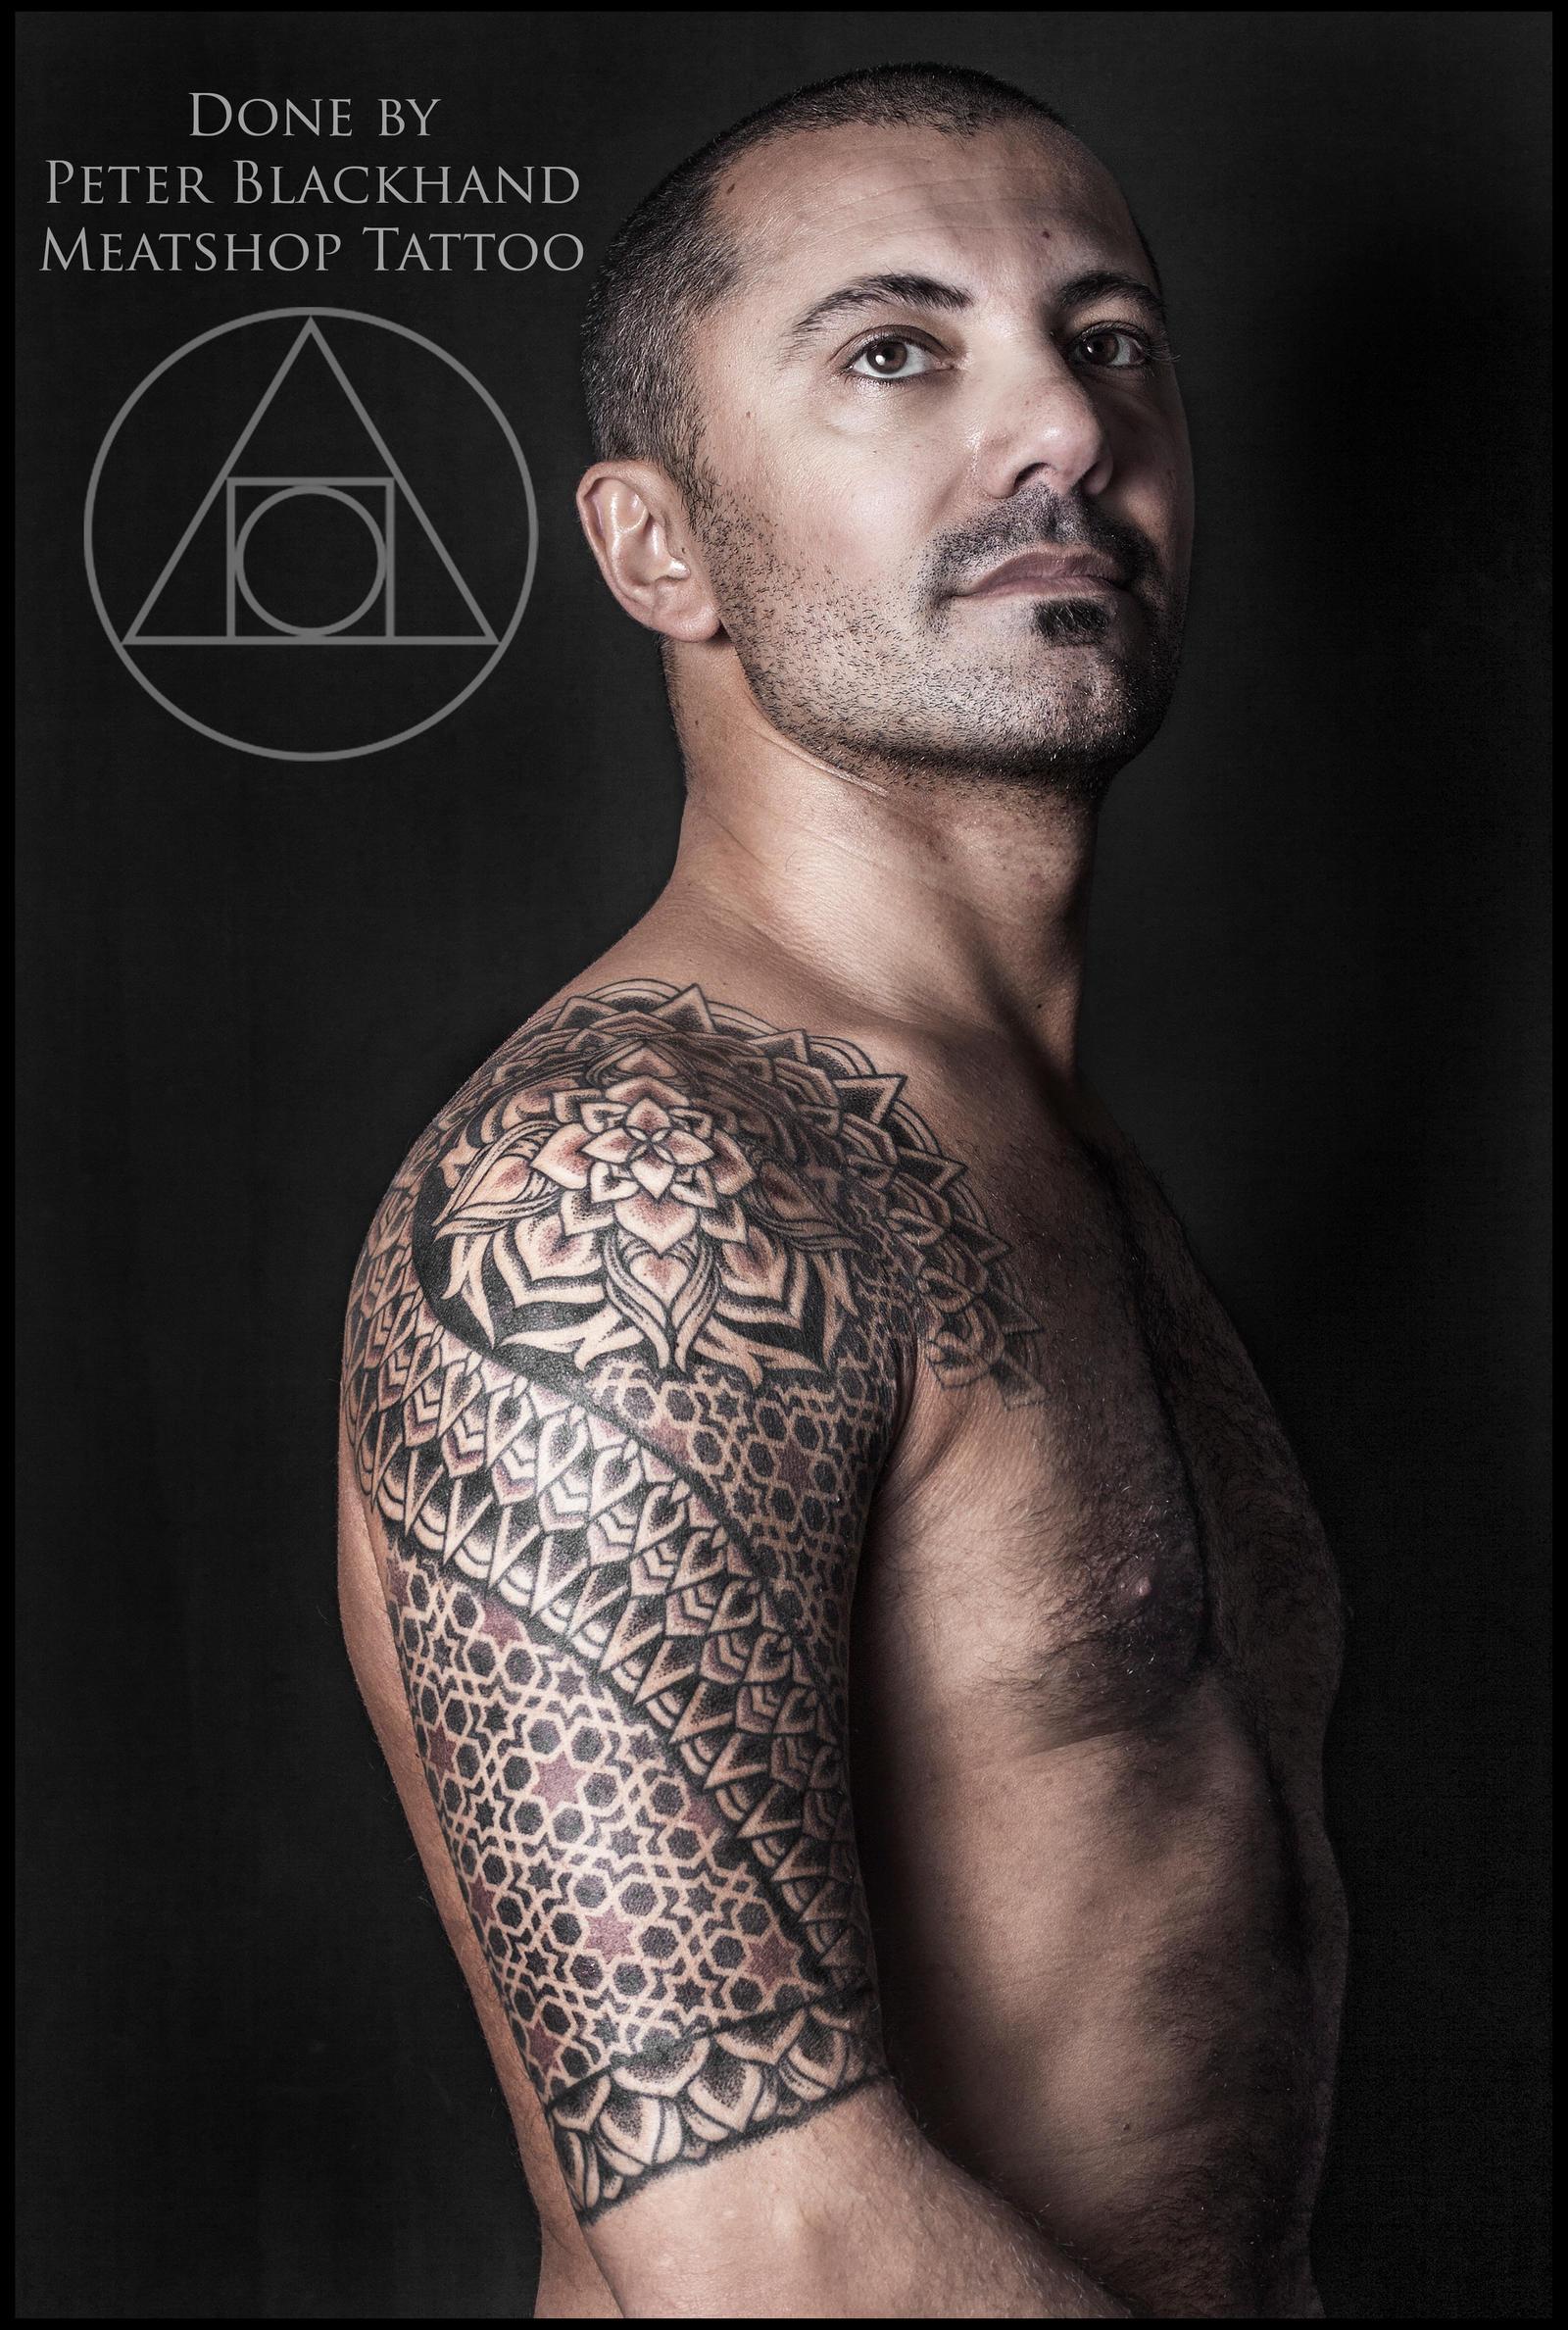 Fire Tattoos Sleeves Arab Mandala Sleeve Tattoo By Peter Blackhand By